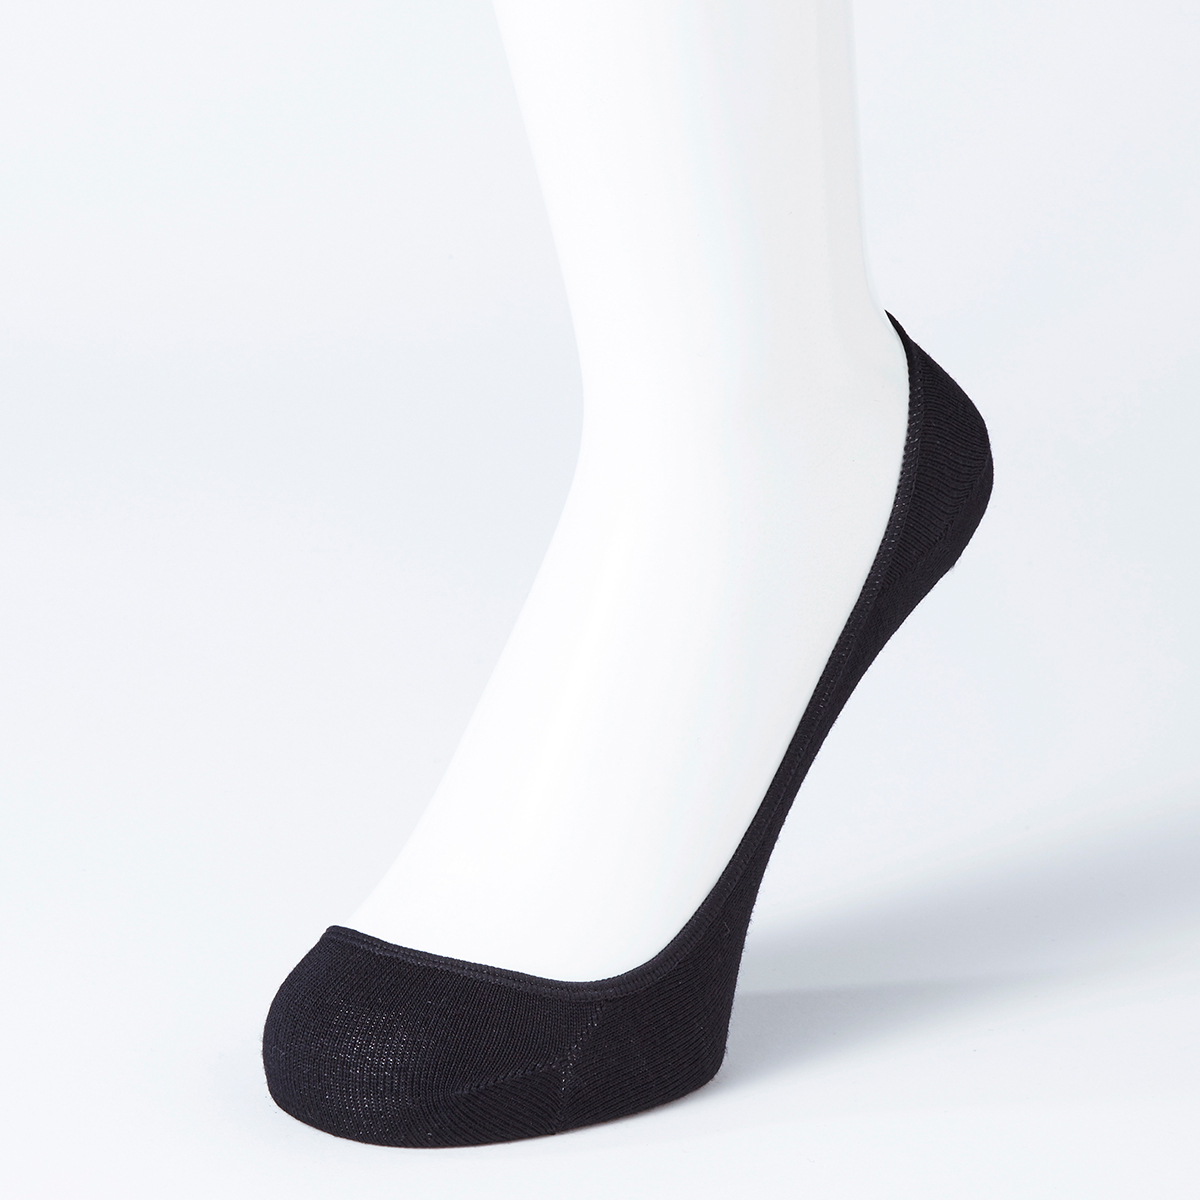 SUPER SOX レディース フットカバー 浅履き 岡本 okamoto 靴下 スーパー ソックス 臭わない 対策 流行 消臭 消臭靴下 婦人靴下 蒸れない カバーソックス 売買 足の臭い くつ下 くつした